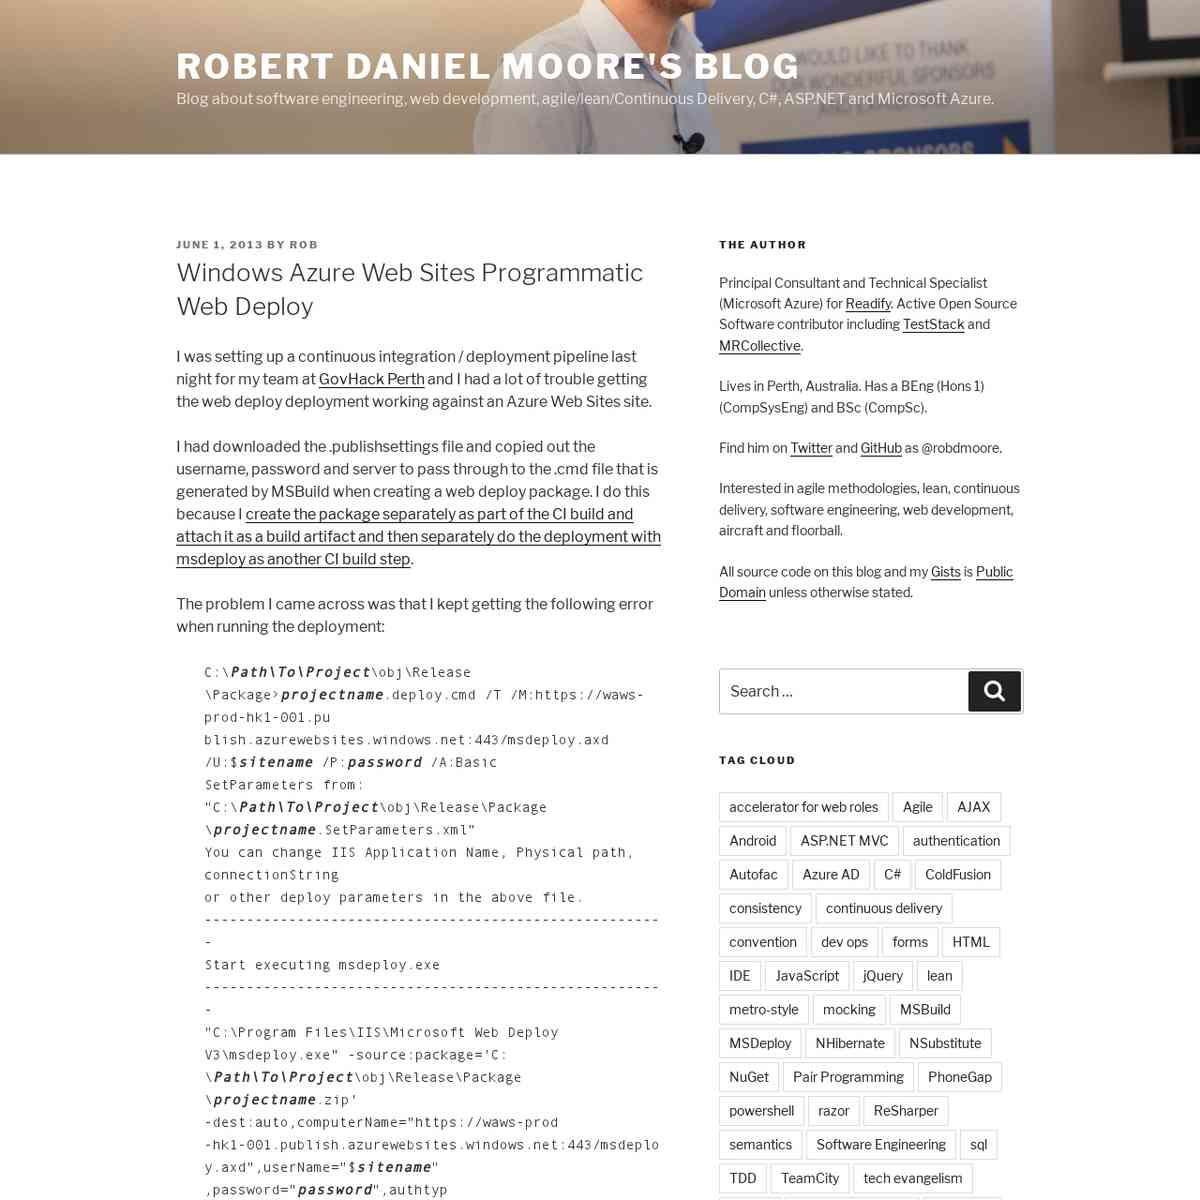 Windows Azure Web Sites Programmatic Web Deploy – Robert Daniel Moore's Blog